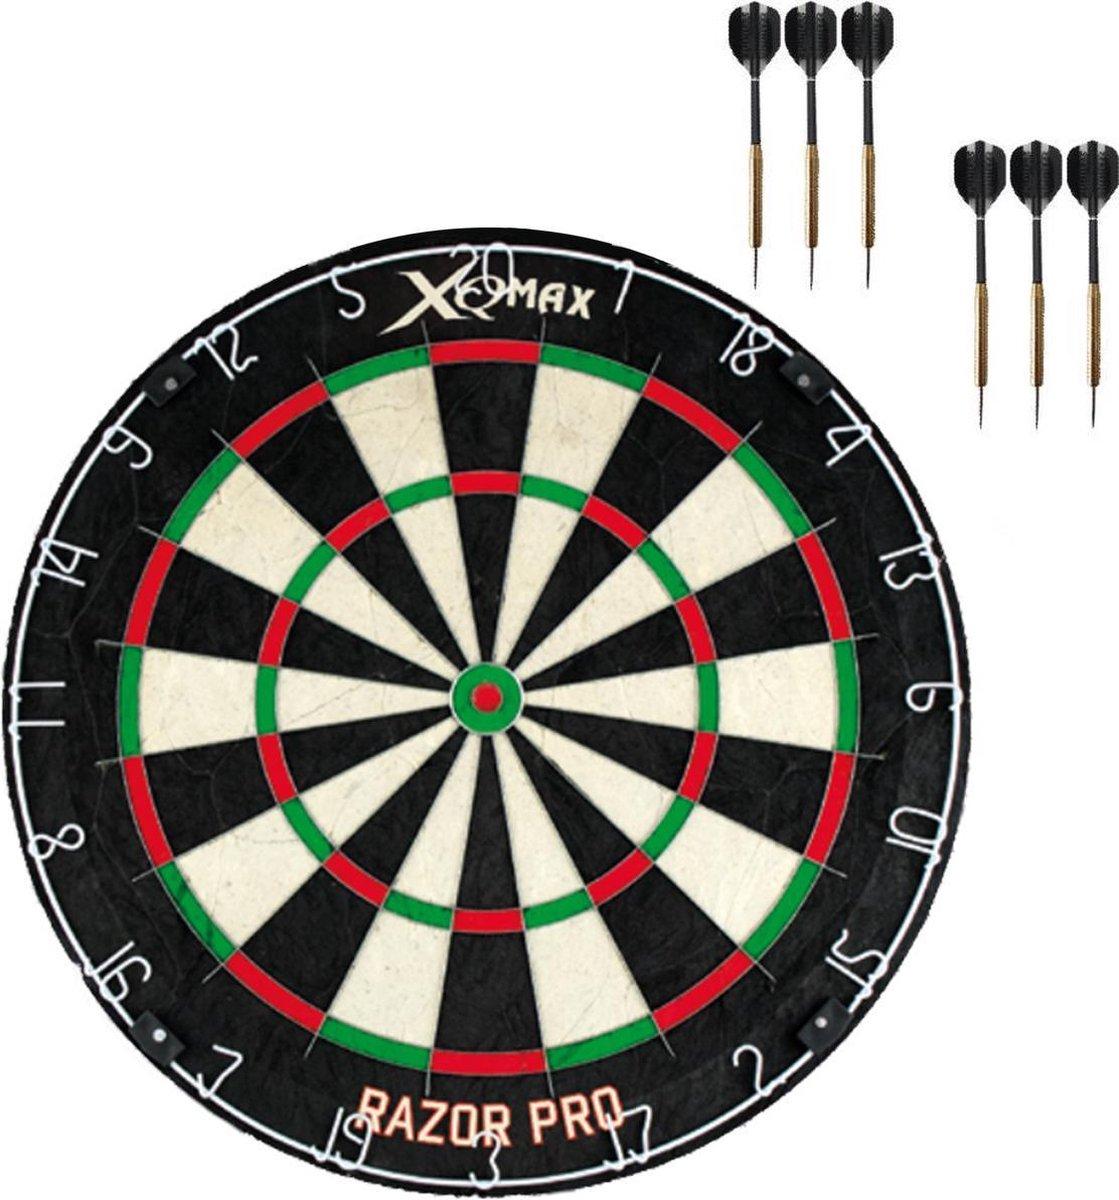 XQ Max Razor PRO + 2 sets dartpijlen - dartset - dartpijlen - dartbord